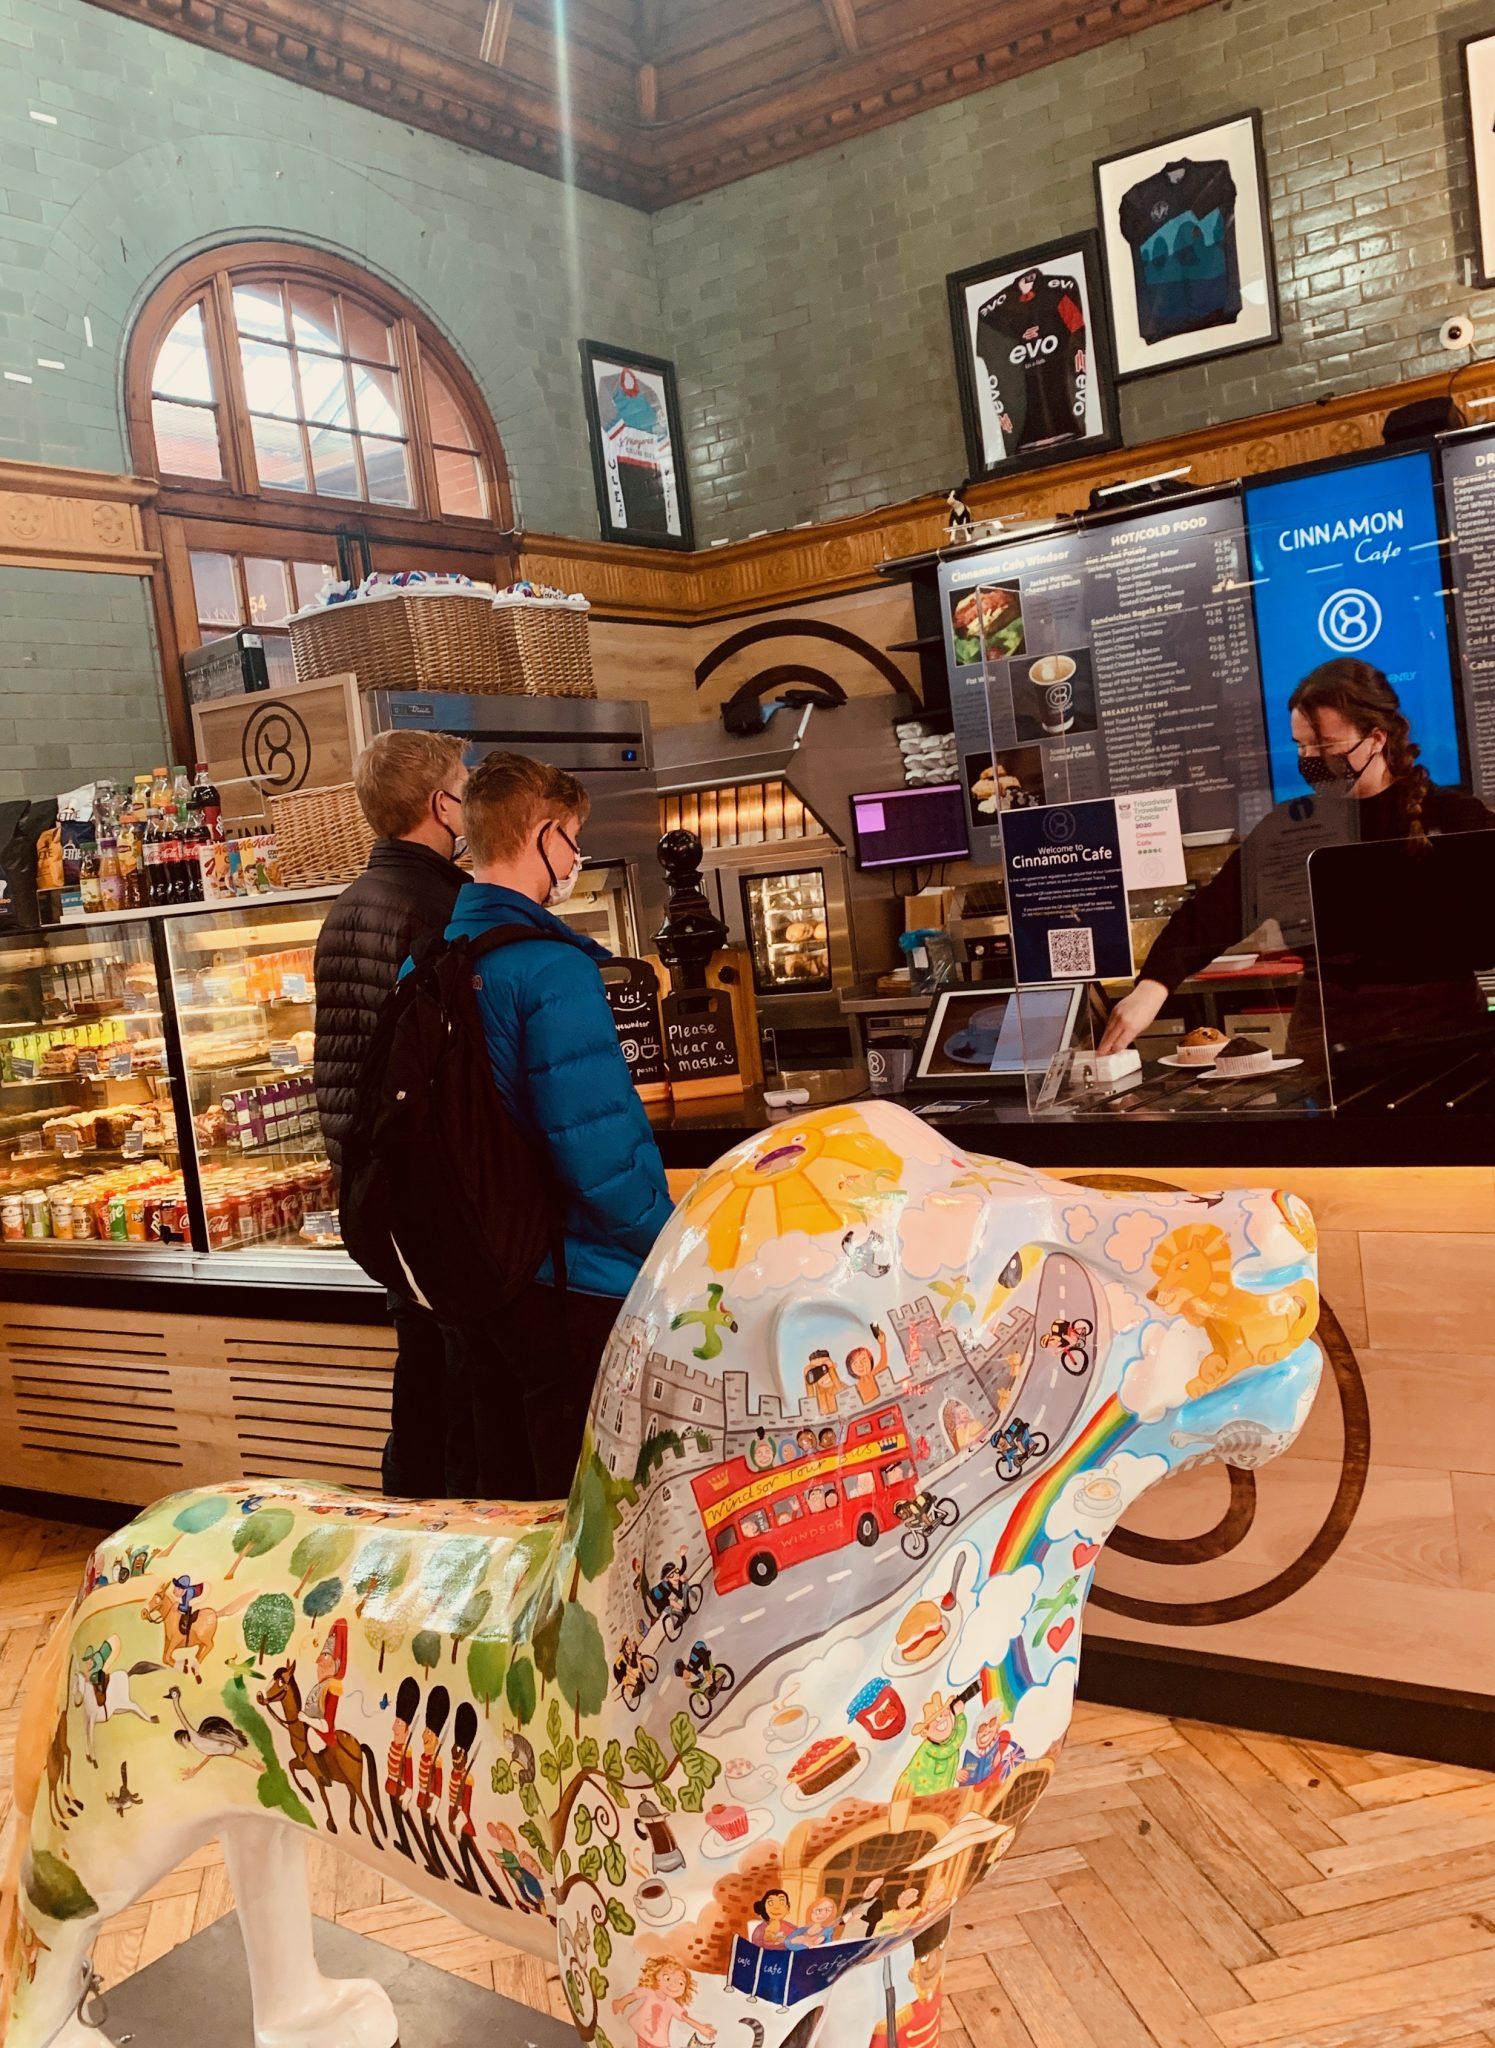 cinnamon cafe in Windsor